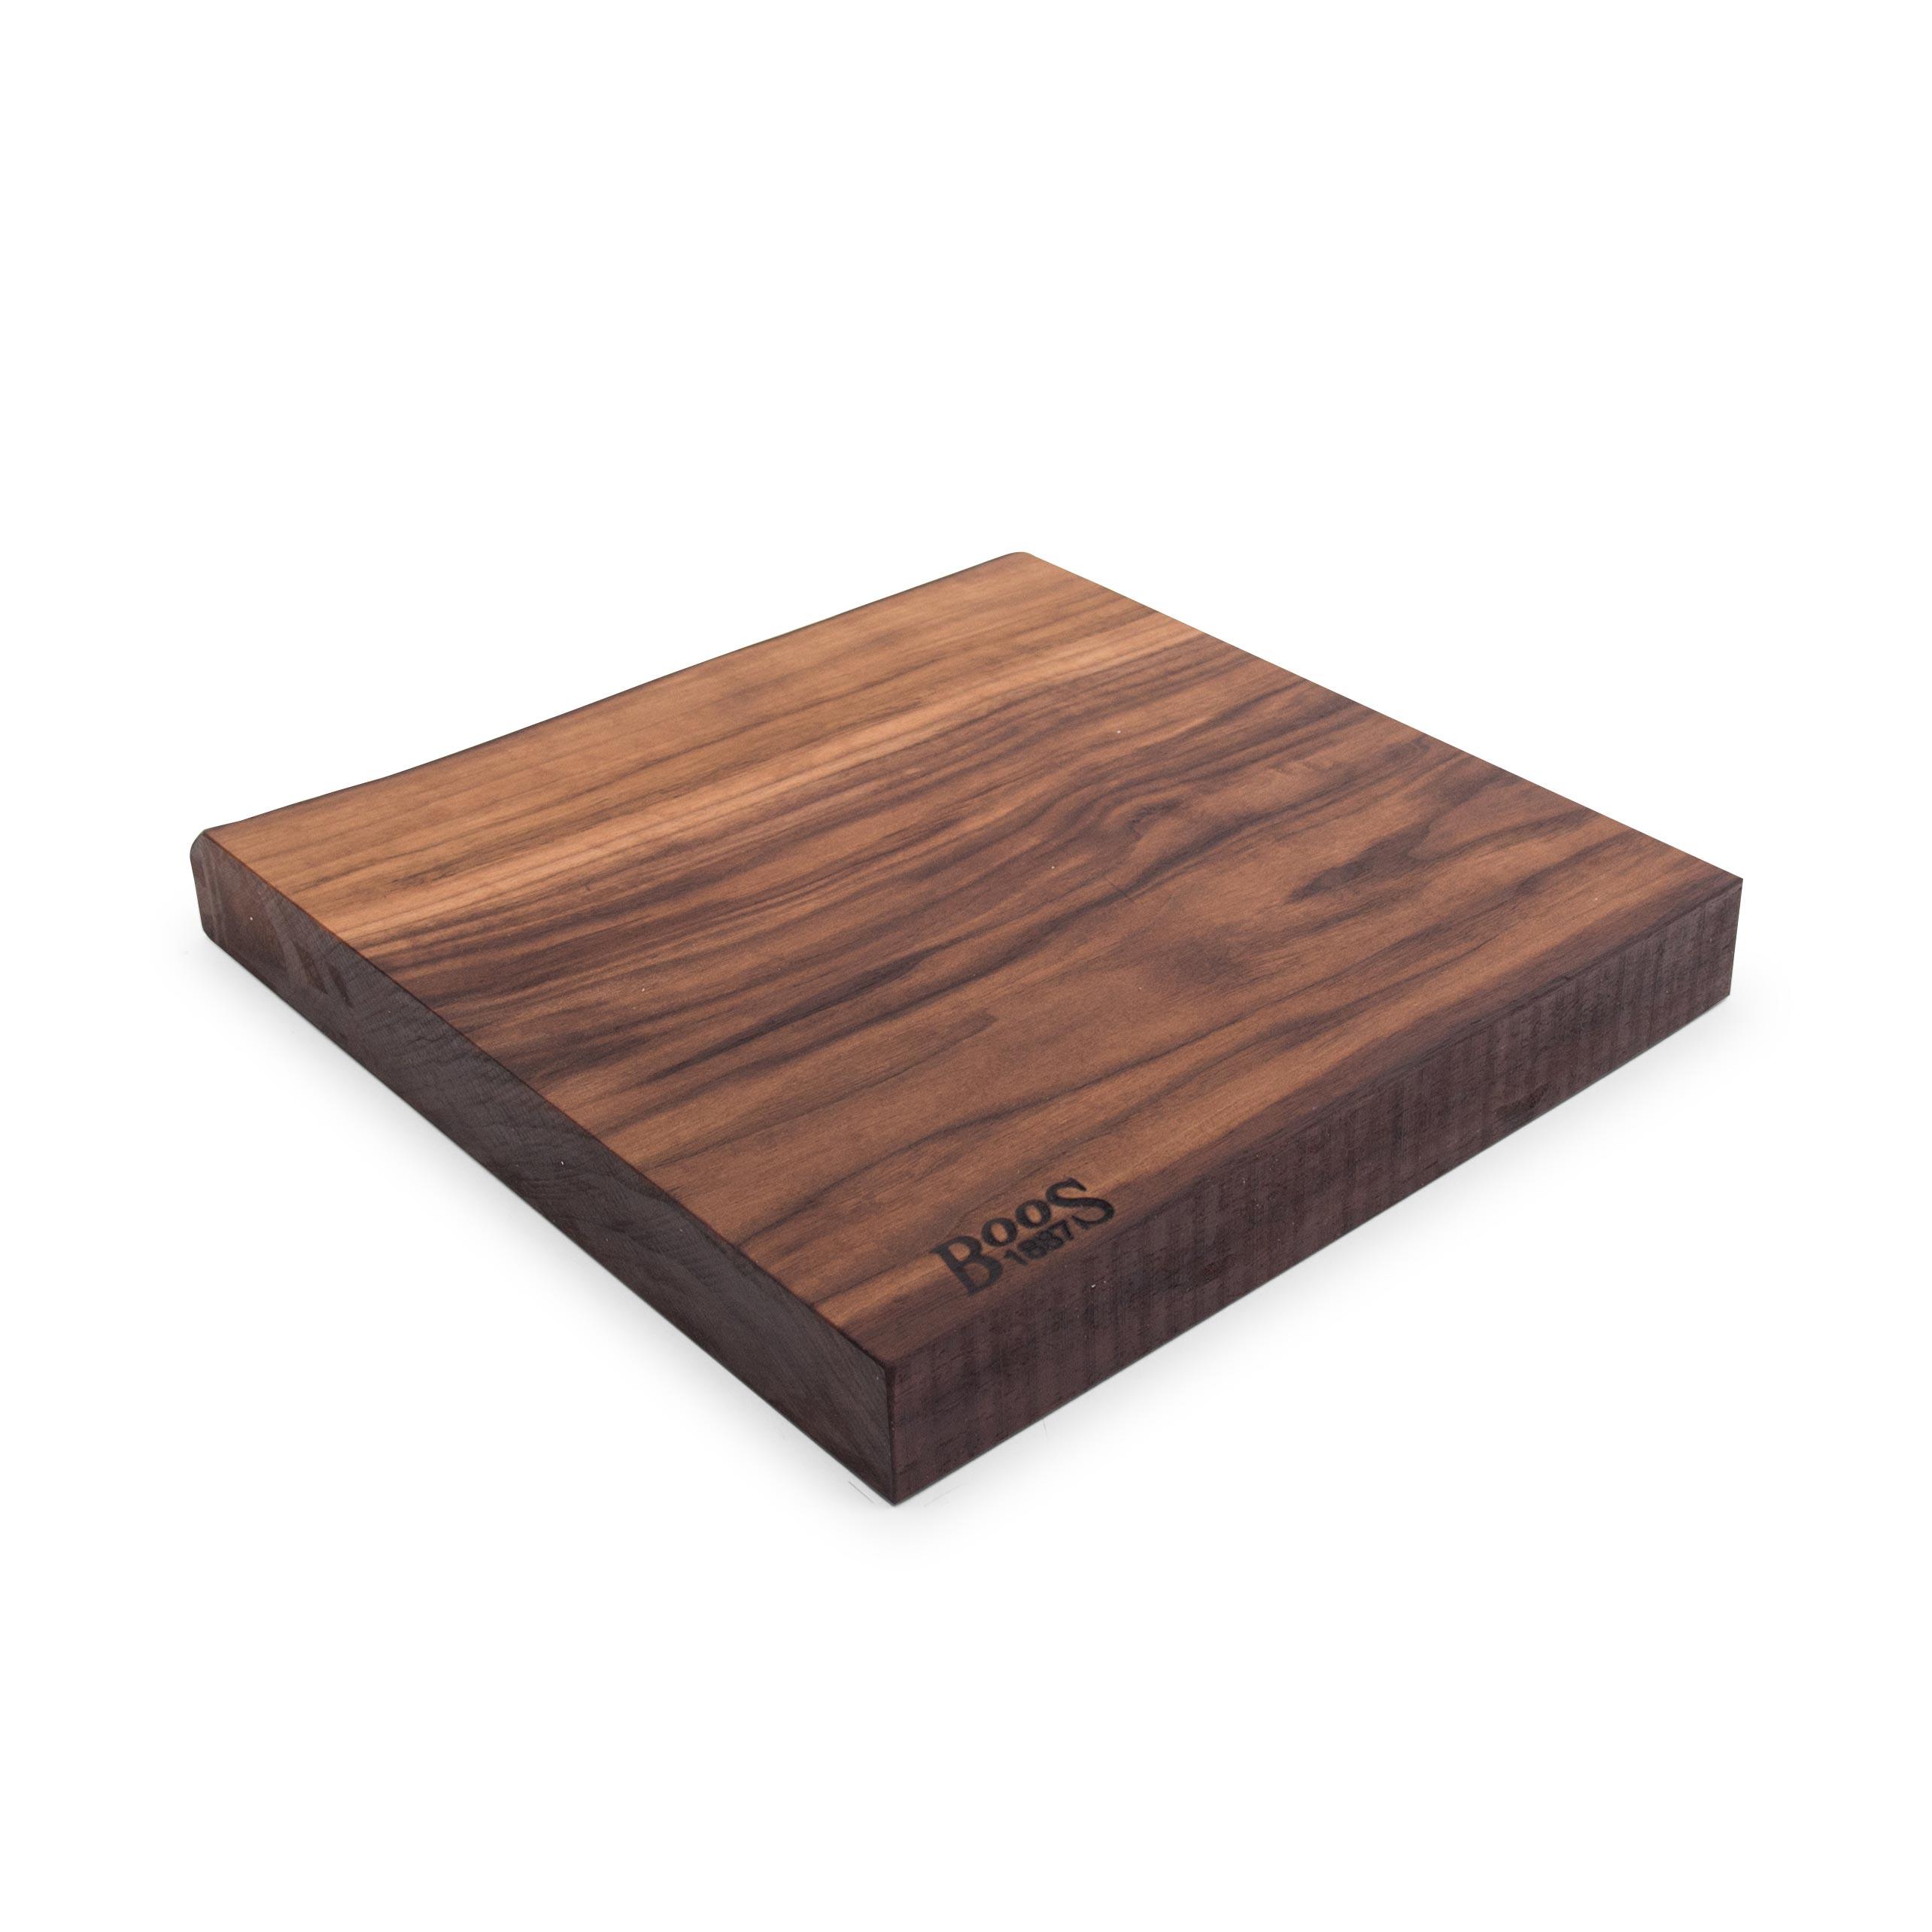 John Boos WAL-RST2112175 cutting board, wood